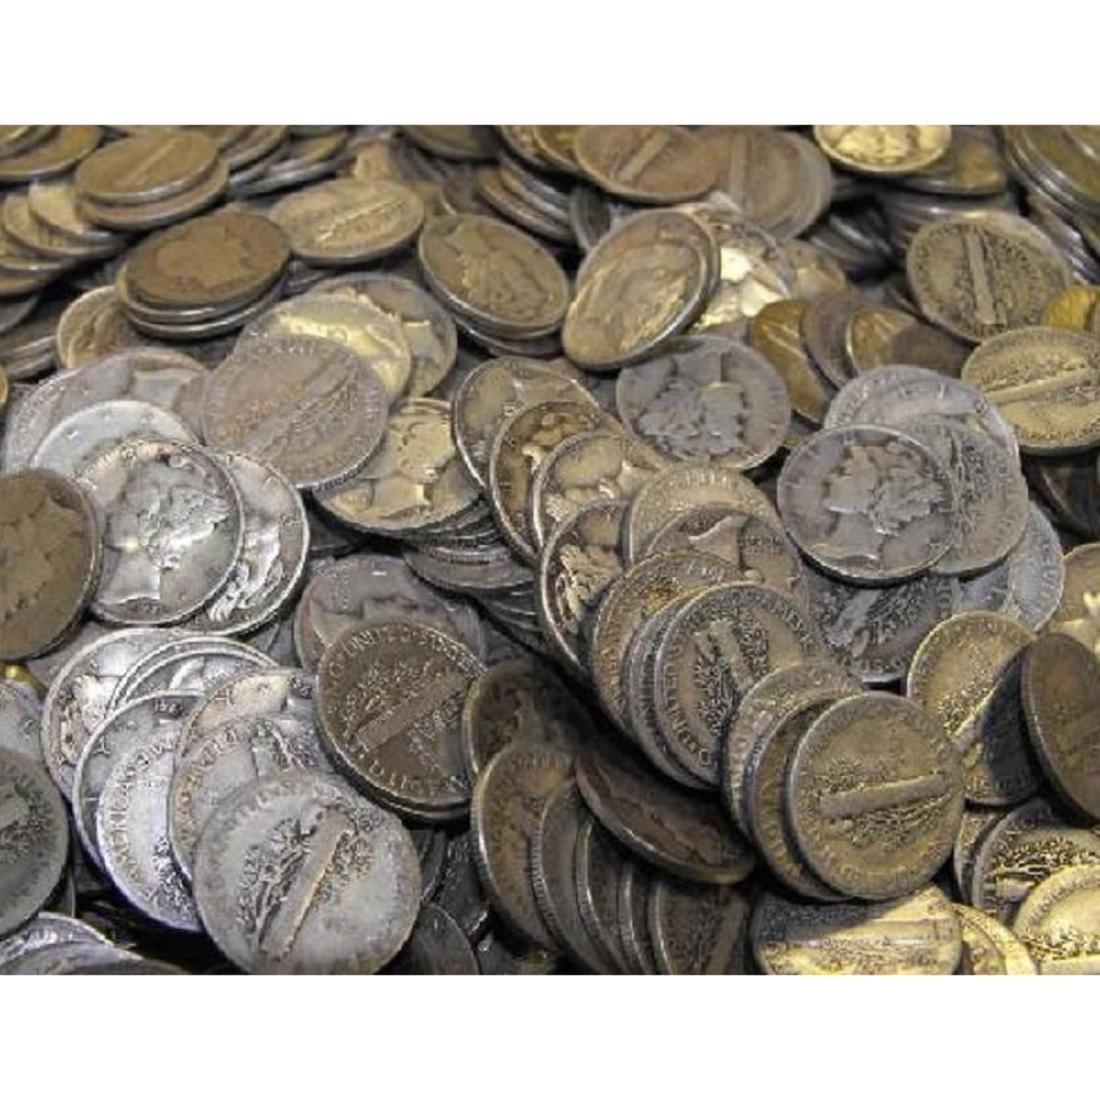 Lot of (300) Mercury Dimes -$30 Face -90% Silver - 2